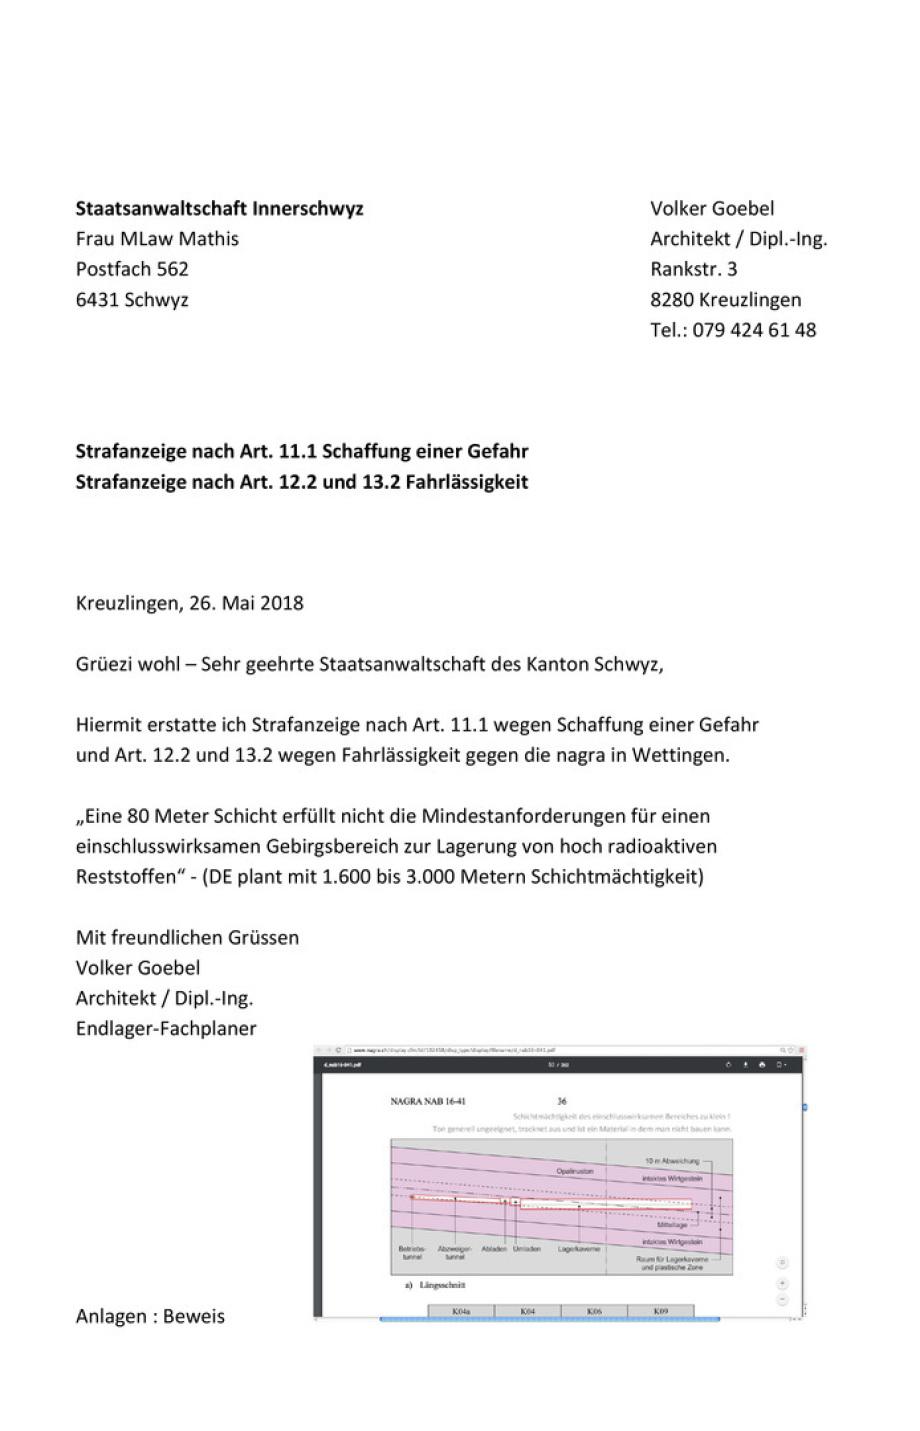 Strafanzeige_02_nagra_Wettingen_Staatsanwaltschaft des Kanton Schwyz Volker Goebel